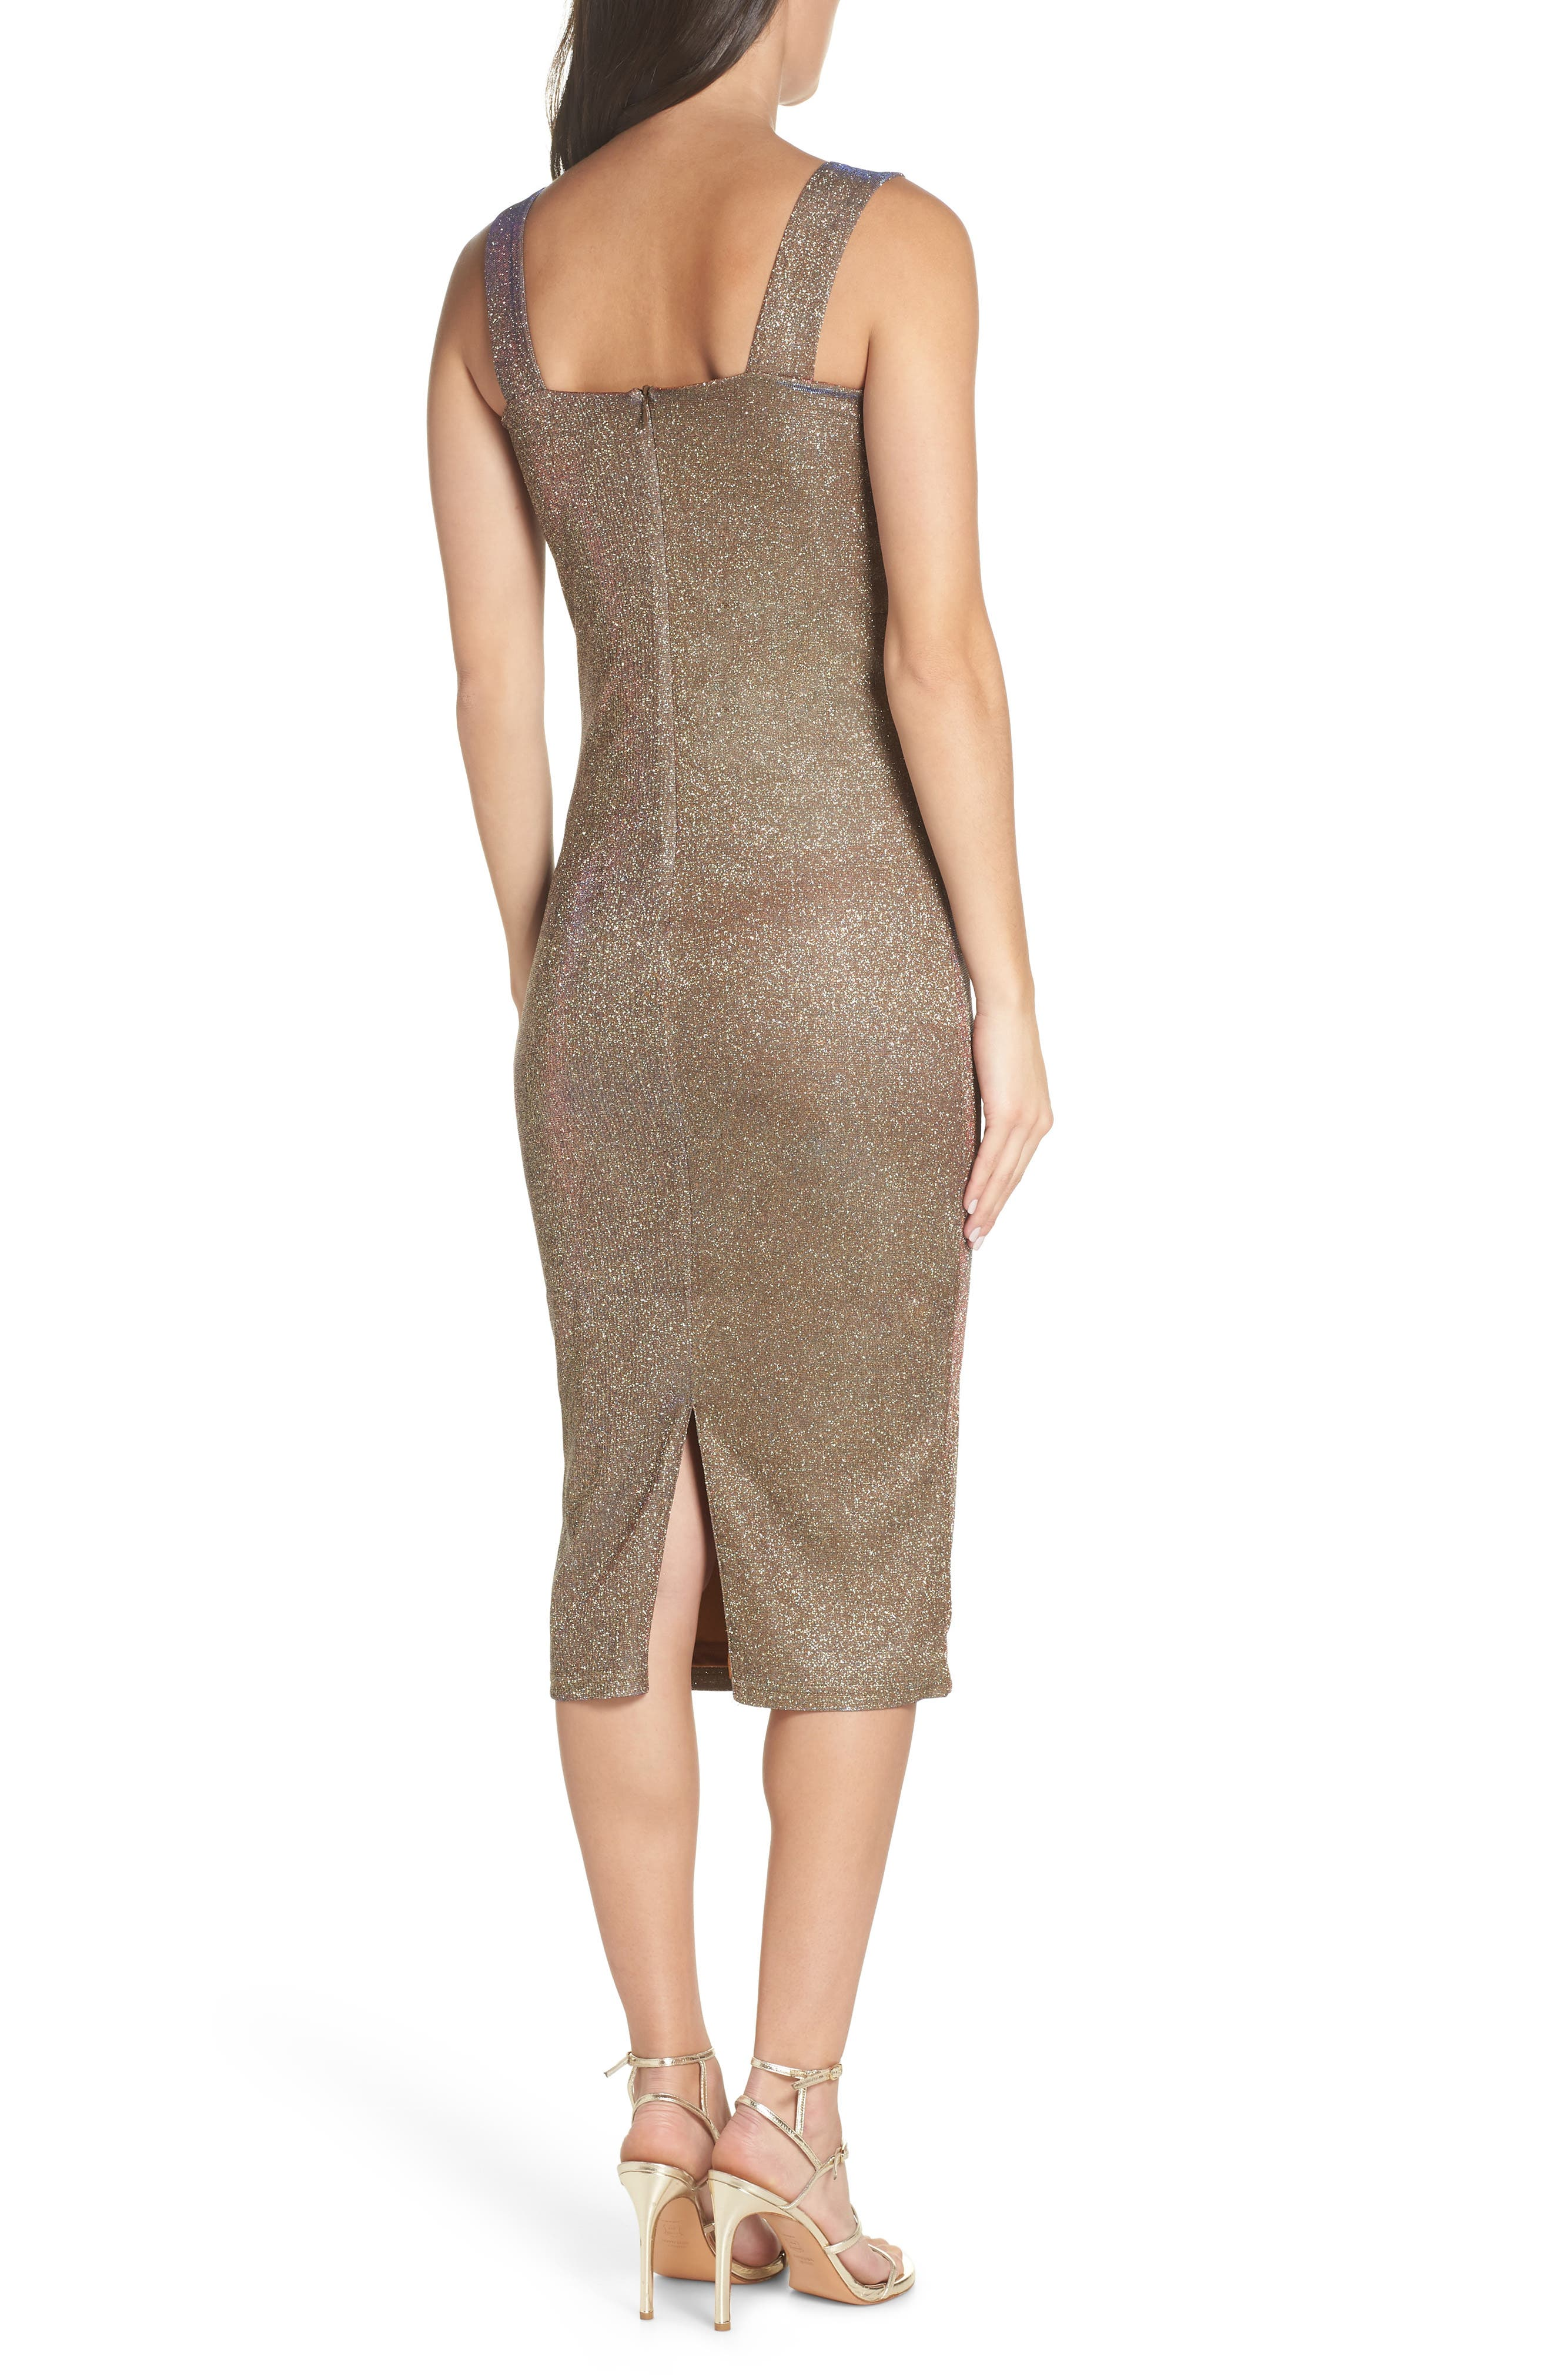 Mimi Sparkle Dress,                             Alternate thumbnail 2, color,                             GOLD